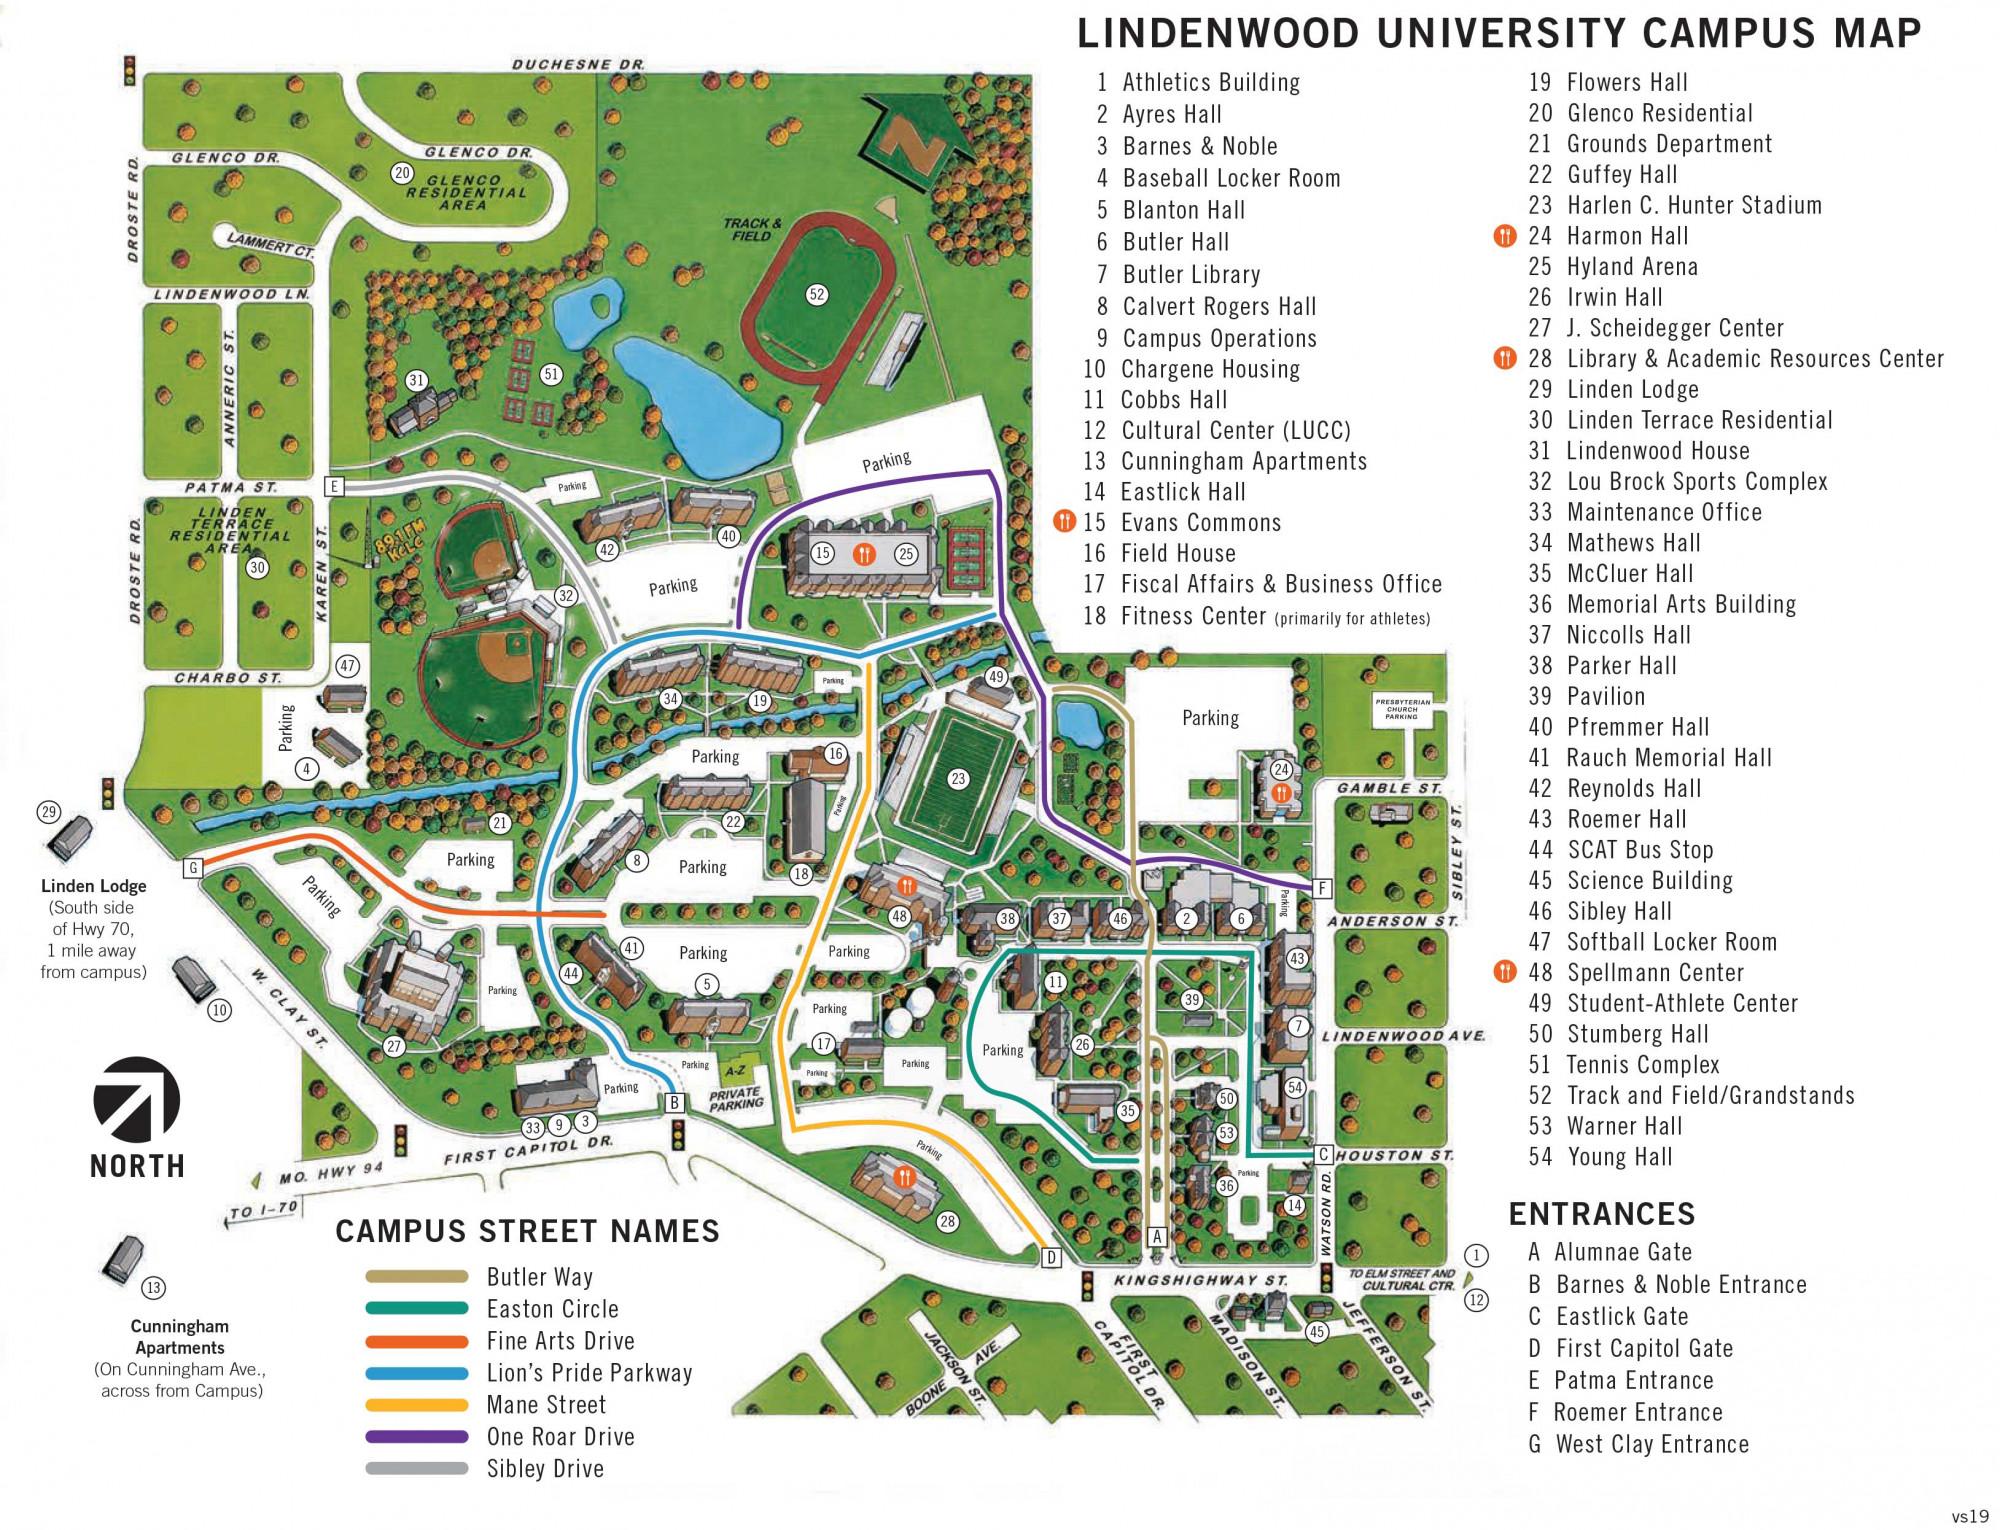 Butler University Campus Map Campus Map for St. Charles | Lindenwood University